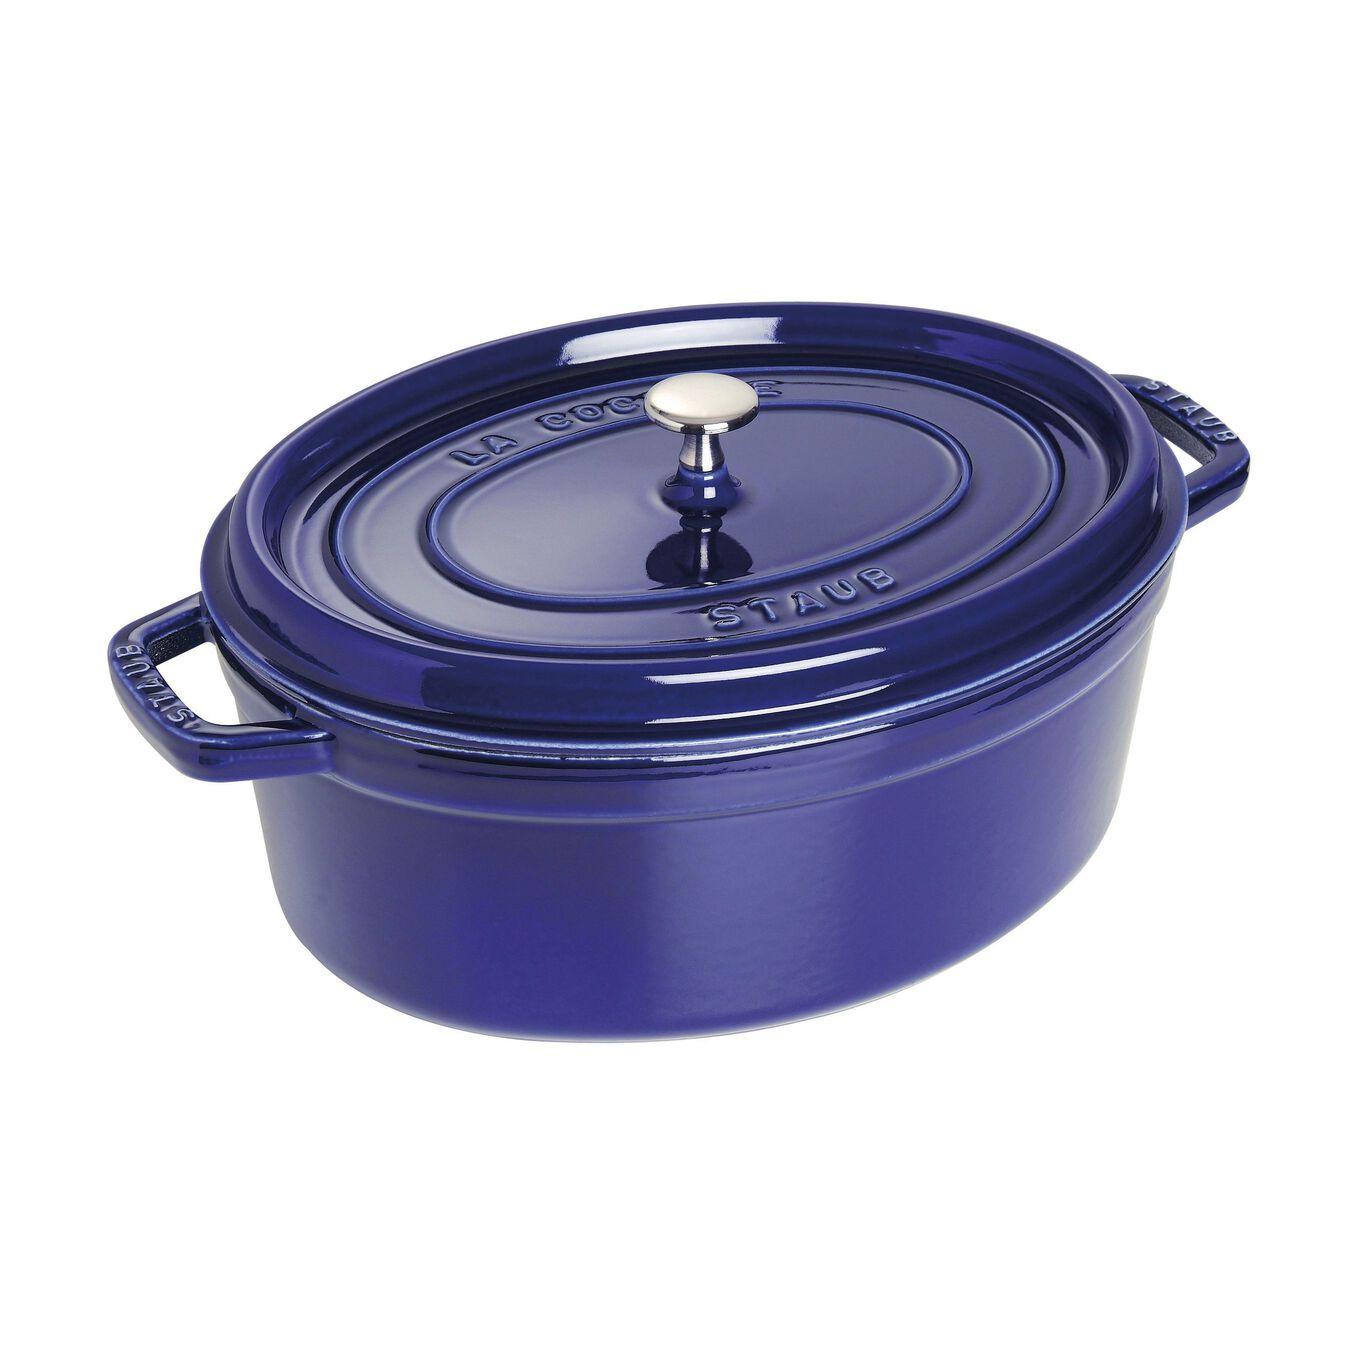 Döküm Tencere | Koyu Mavi | 27 cm | 3,25 l | oval,,large 1